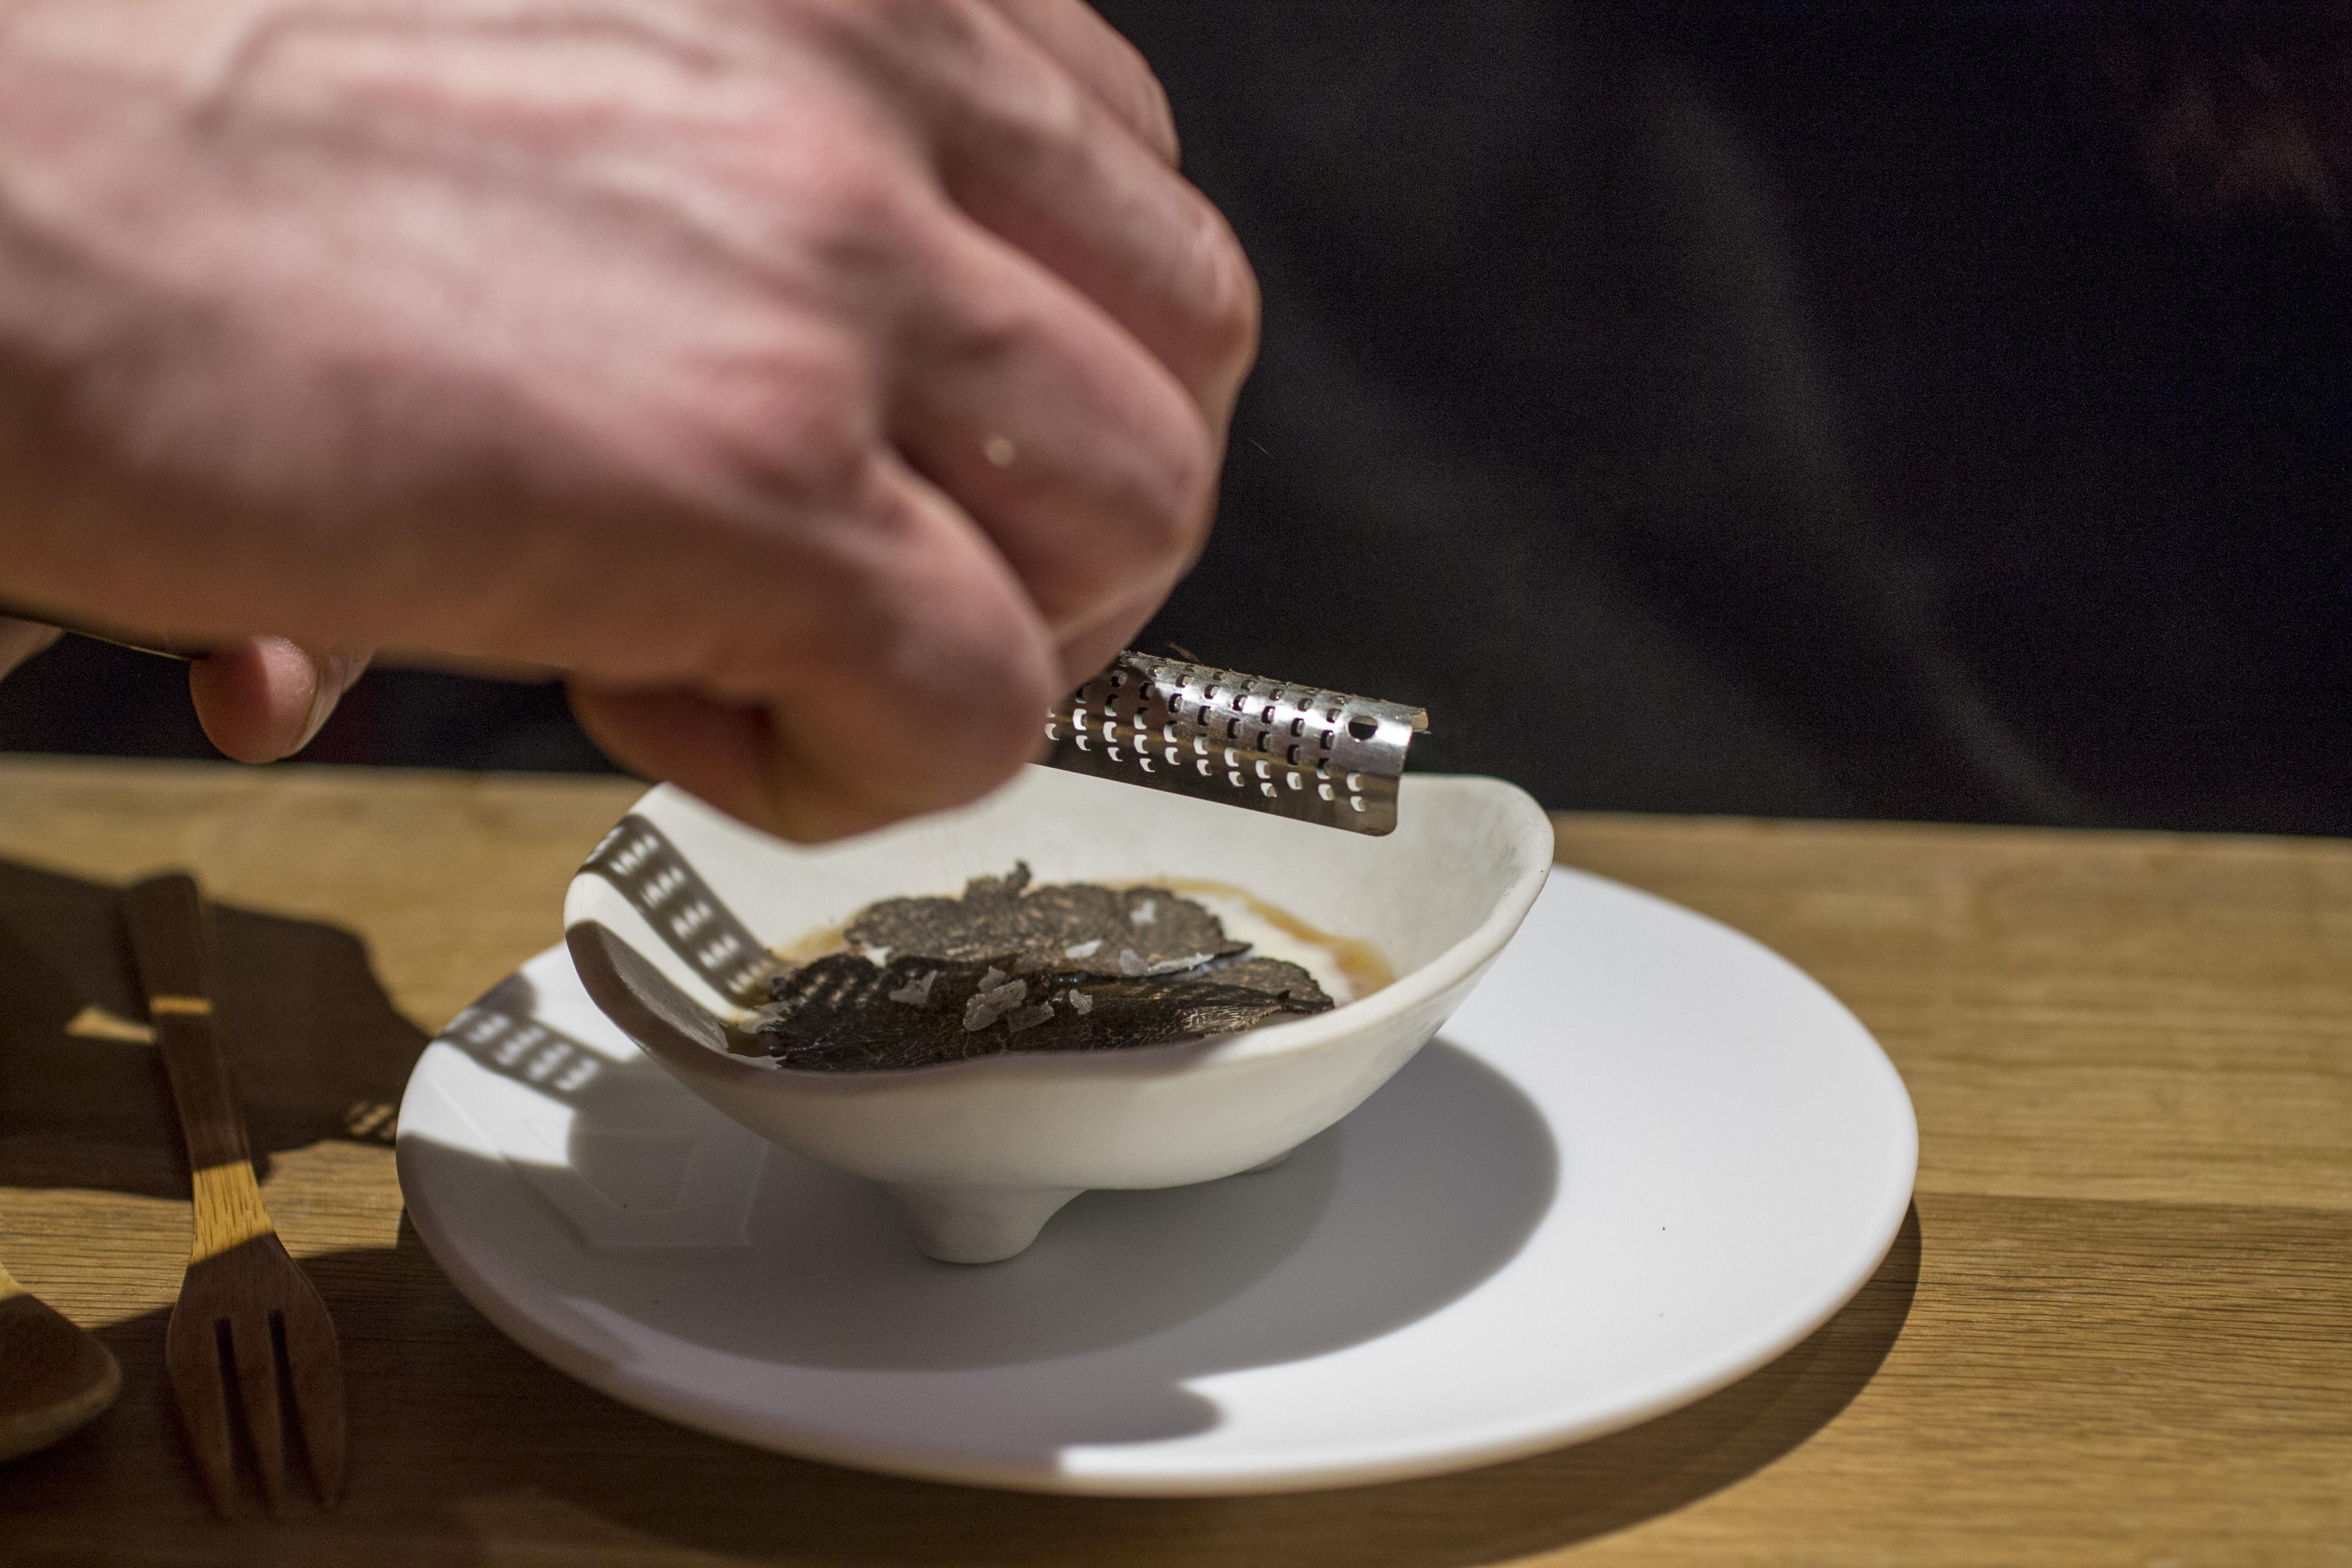 Wasabi cristallizato, Pakta, Chef Albert Adrià, Kyoko li, Barcelona